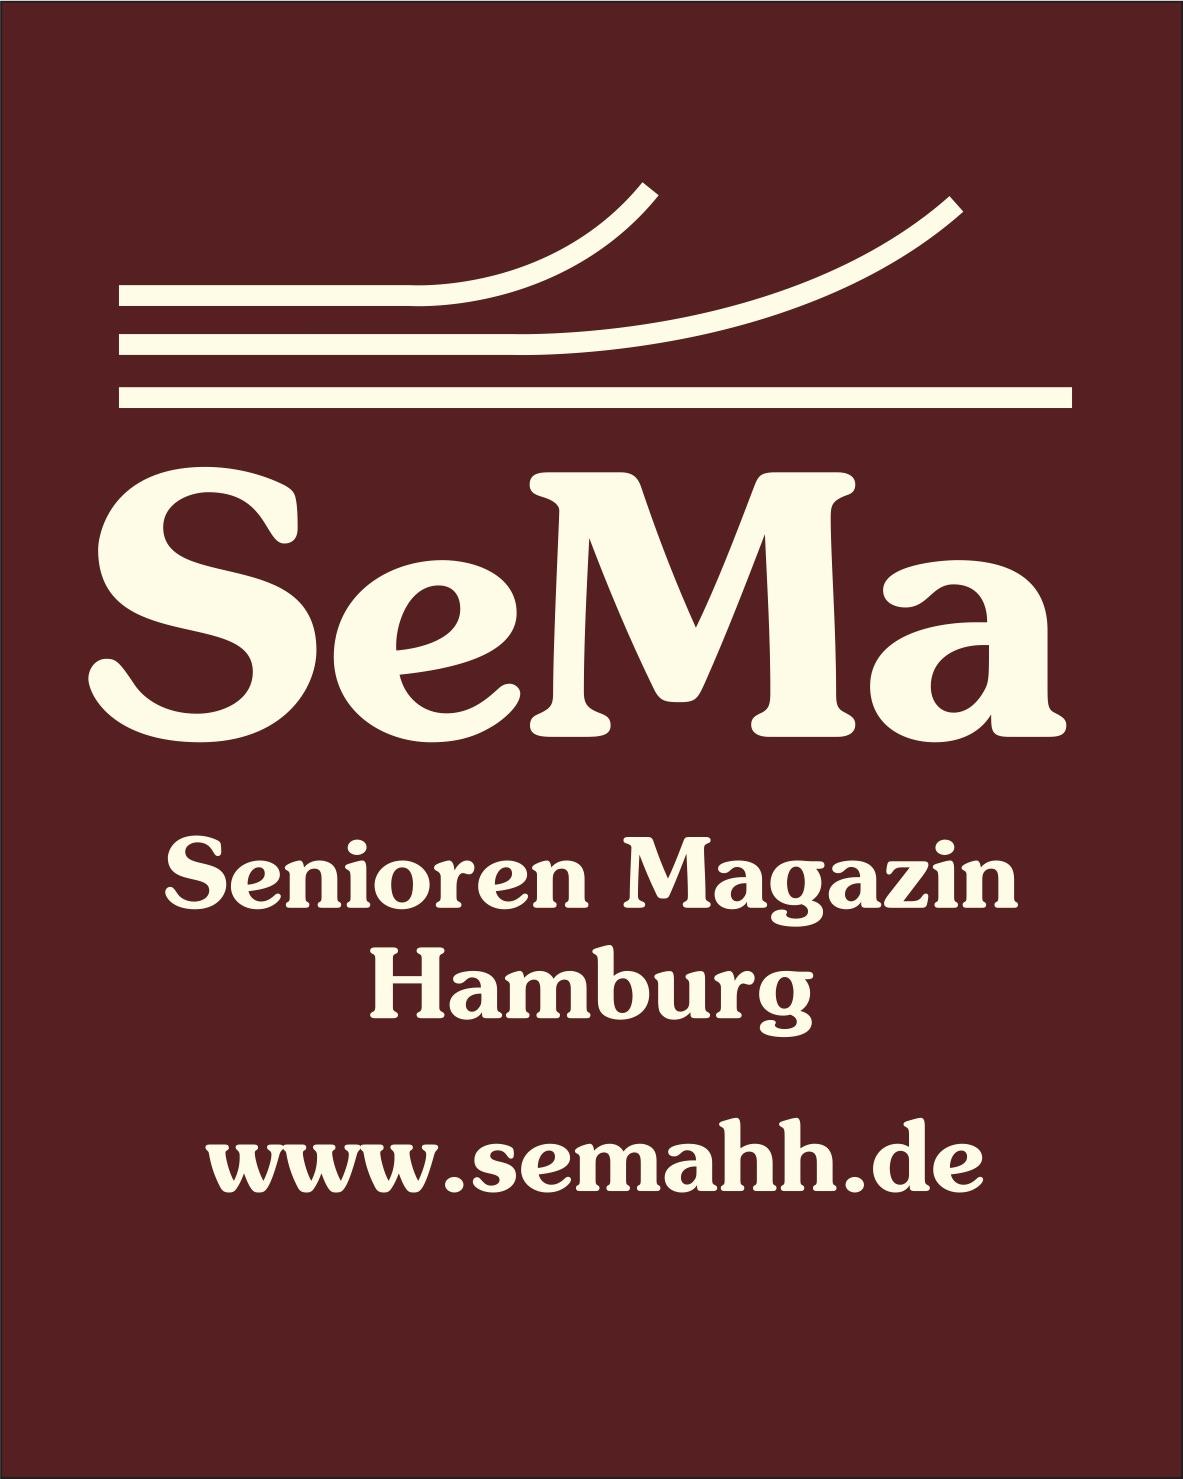 sema_skalierebar_www